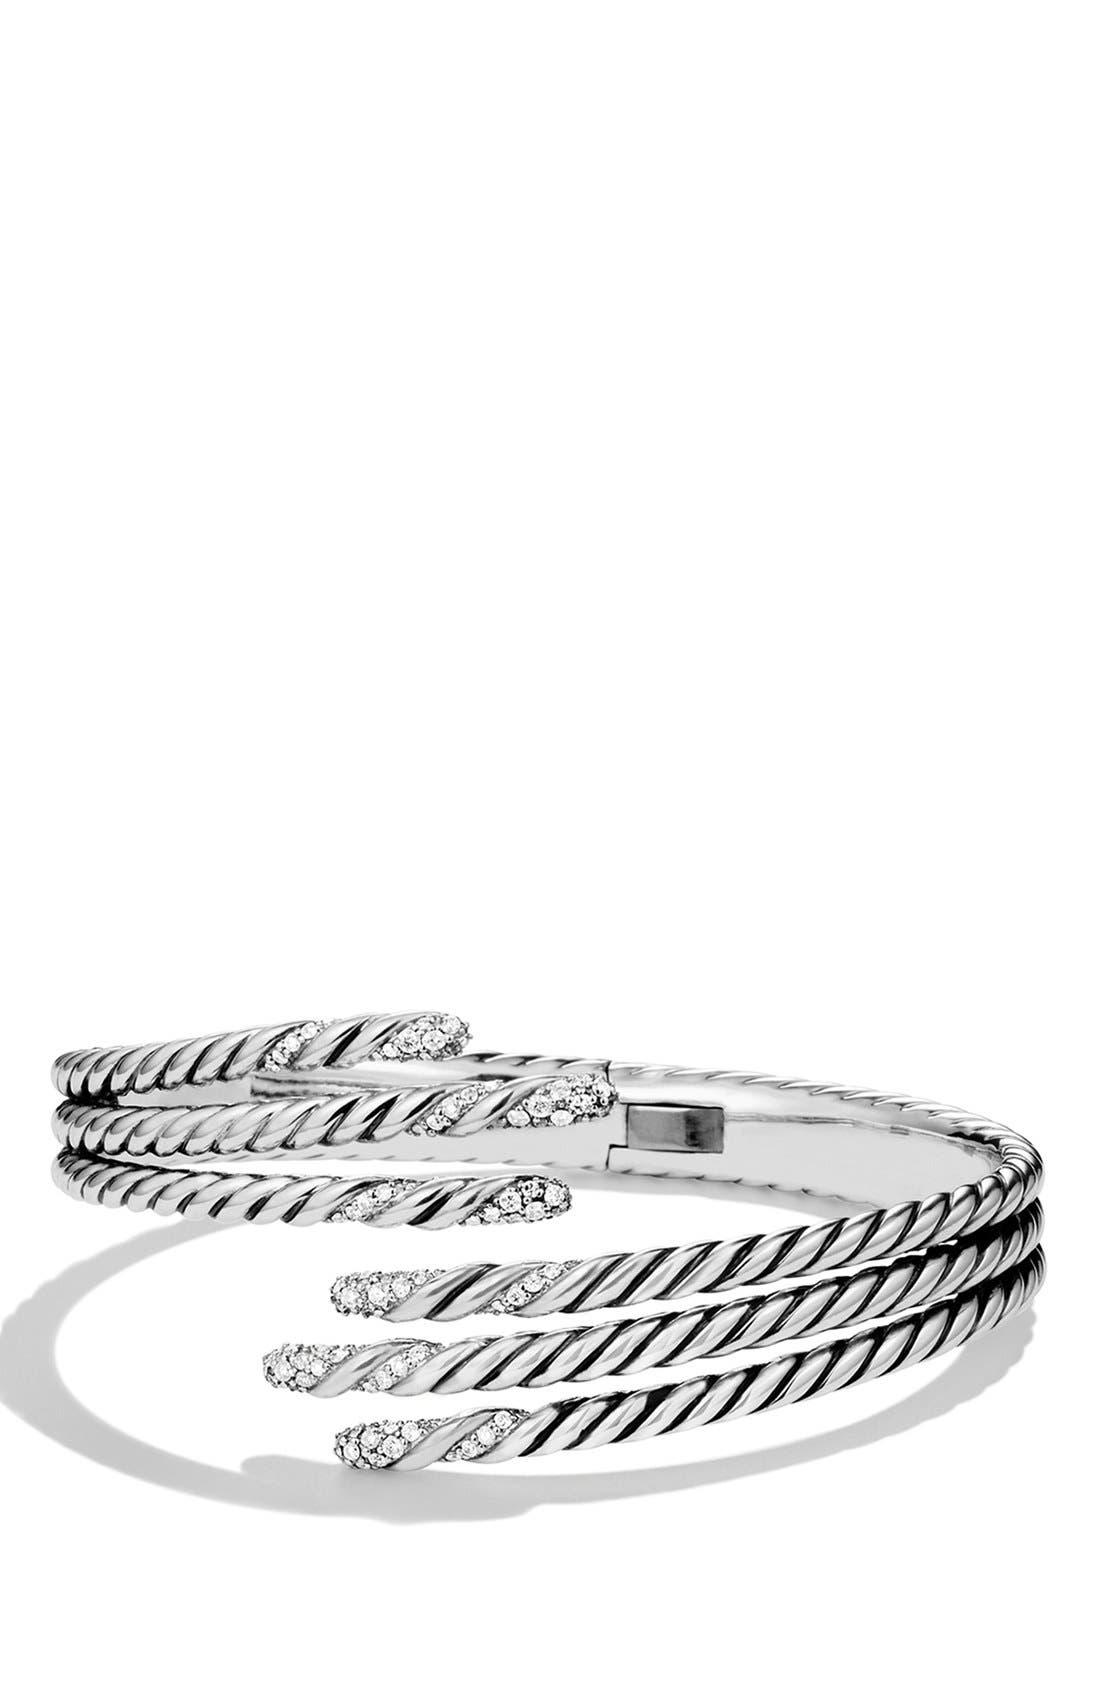 David Yurman 'Willow' Open Three-Row Bracelet with Diamonds